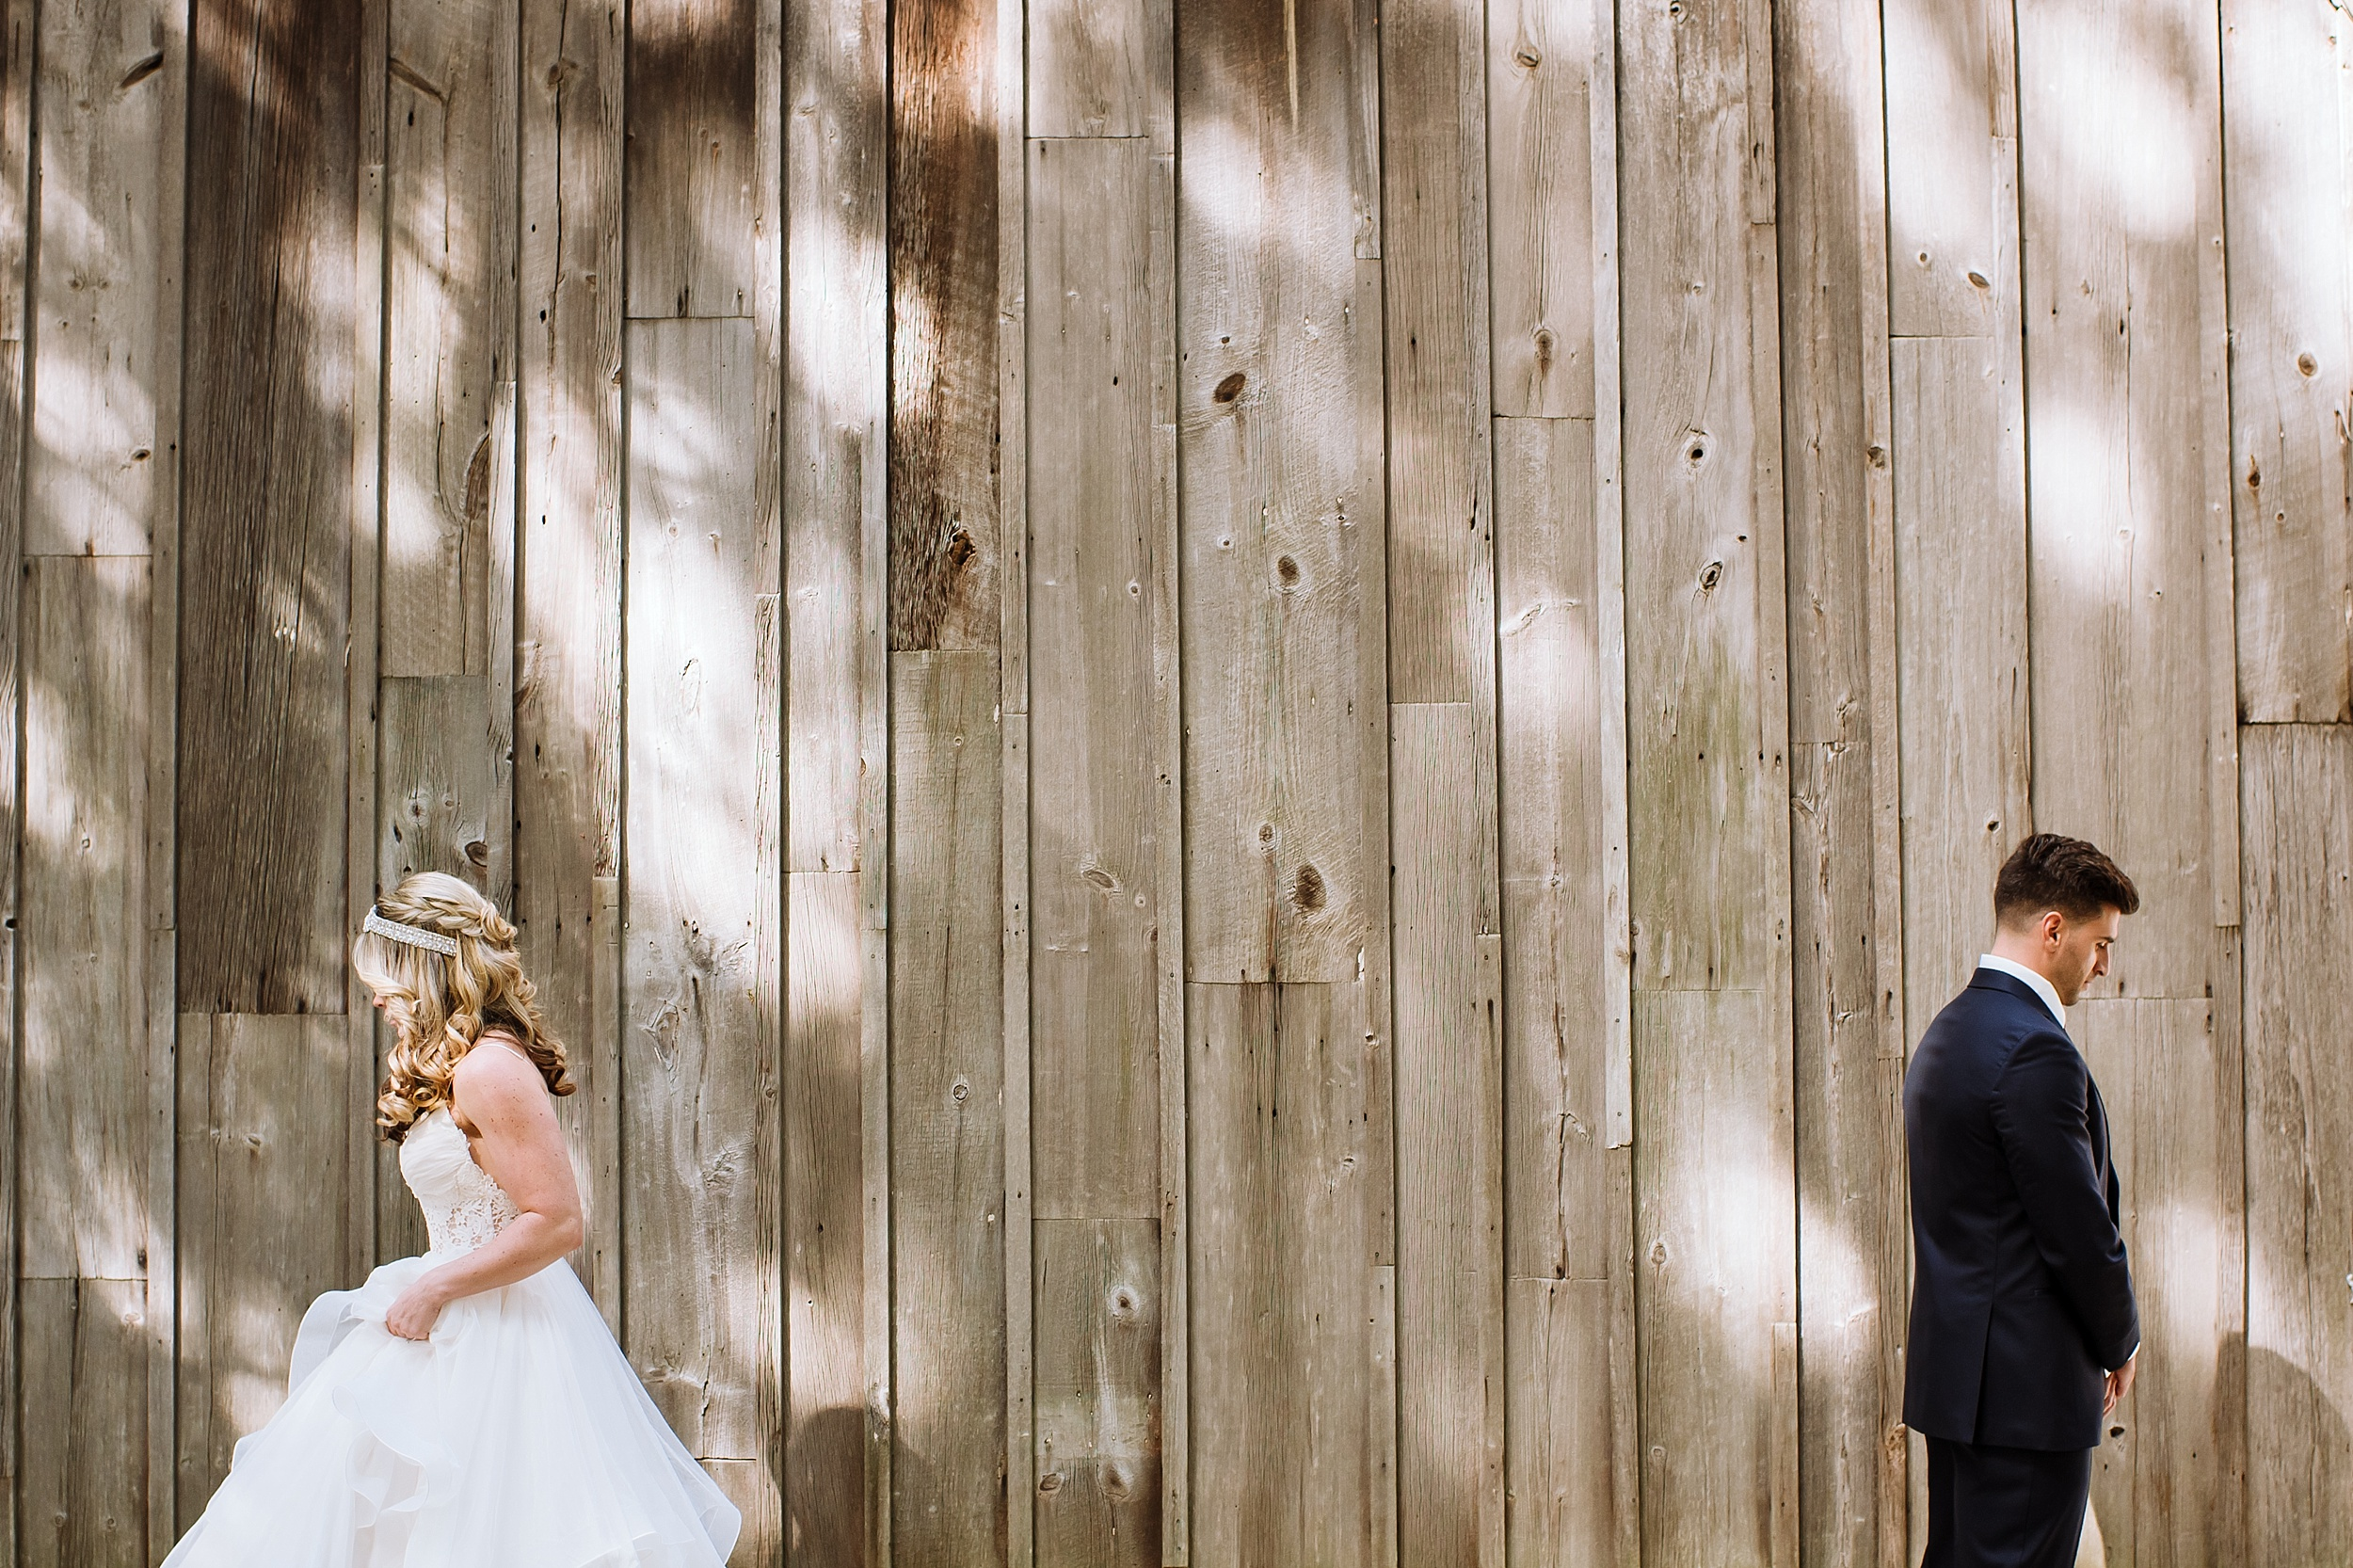 McMichael_Art_Collection_Wedding_chateau_le_jardin_Justine_Munro_Toronto_Photographer004.jpg